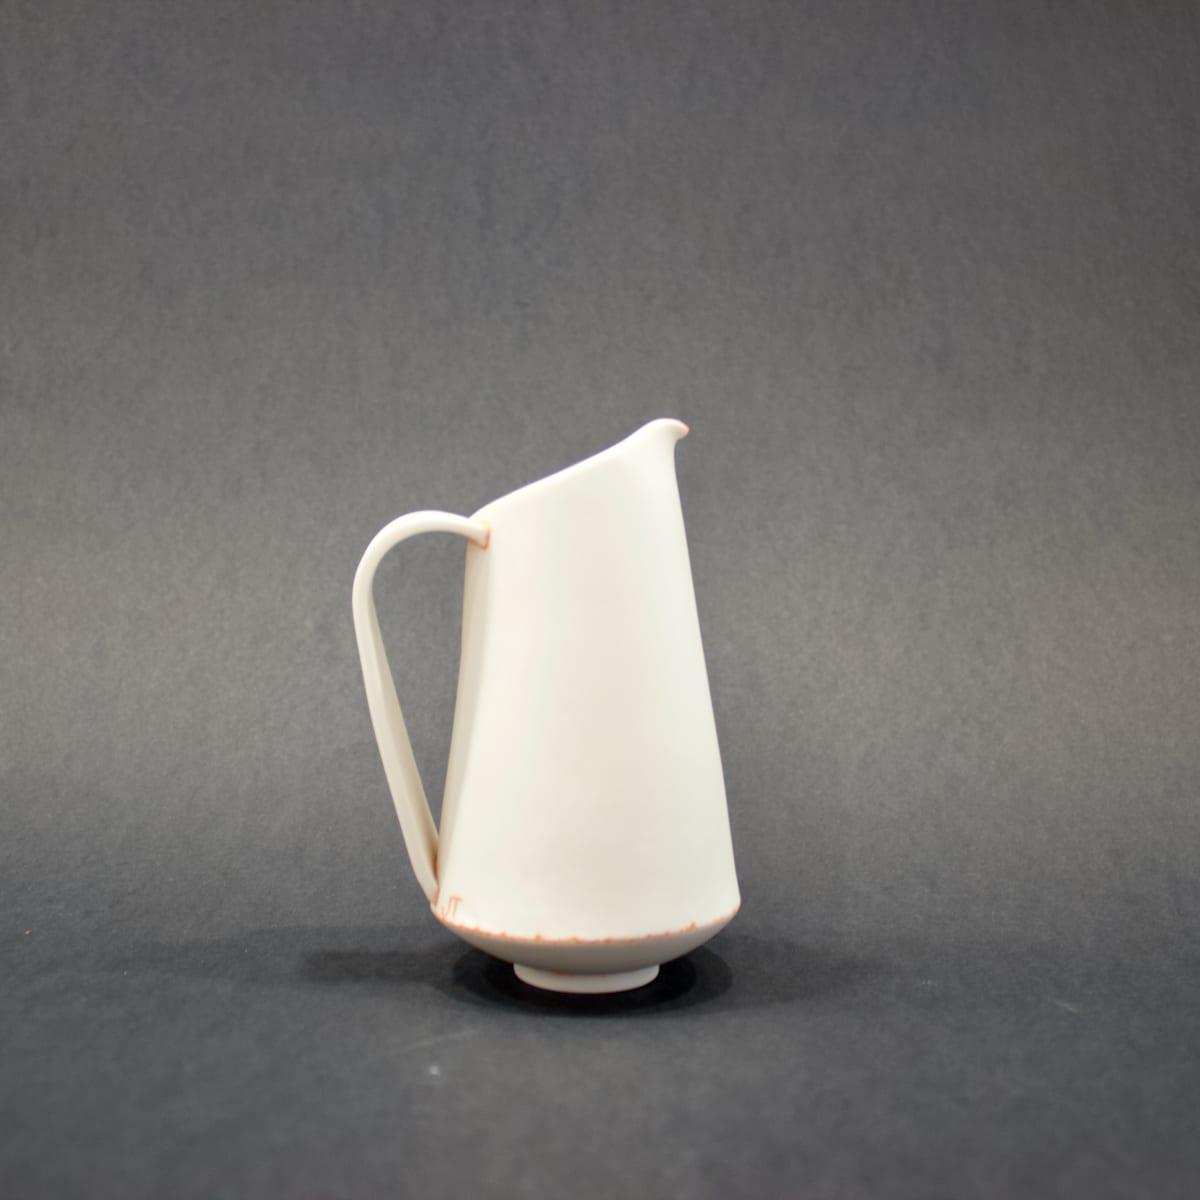 Jessica Thorn Milk Jug, Orange, 2019 Porcelain 13 x 8 x 6 cm 5 1/8 x 3 1/8 x 2 3/8 in